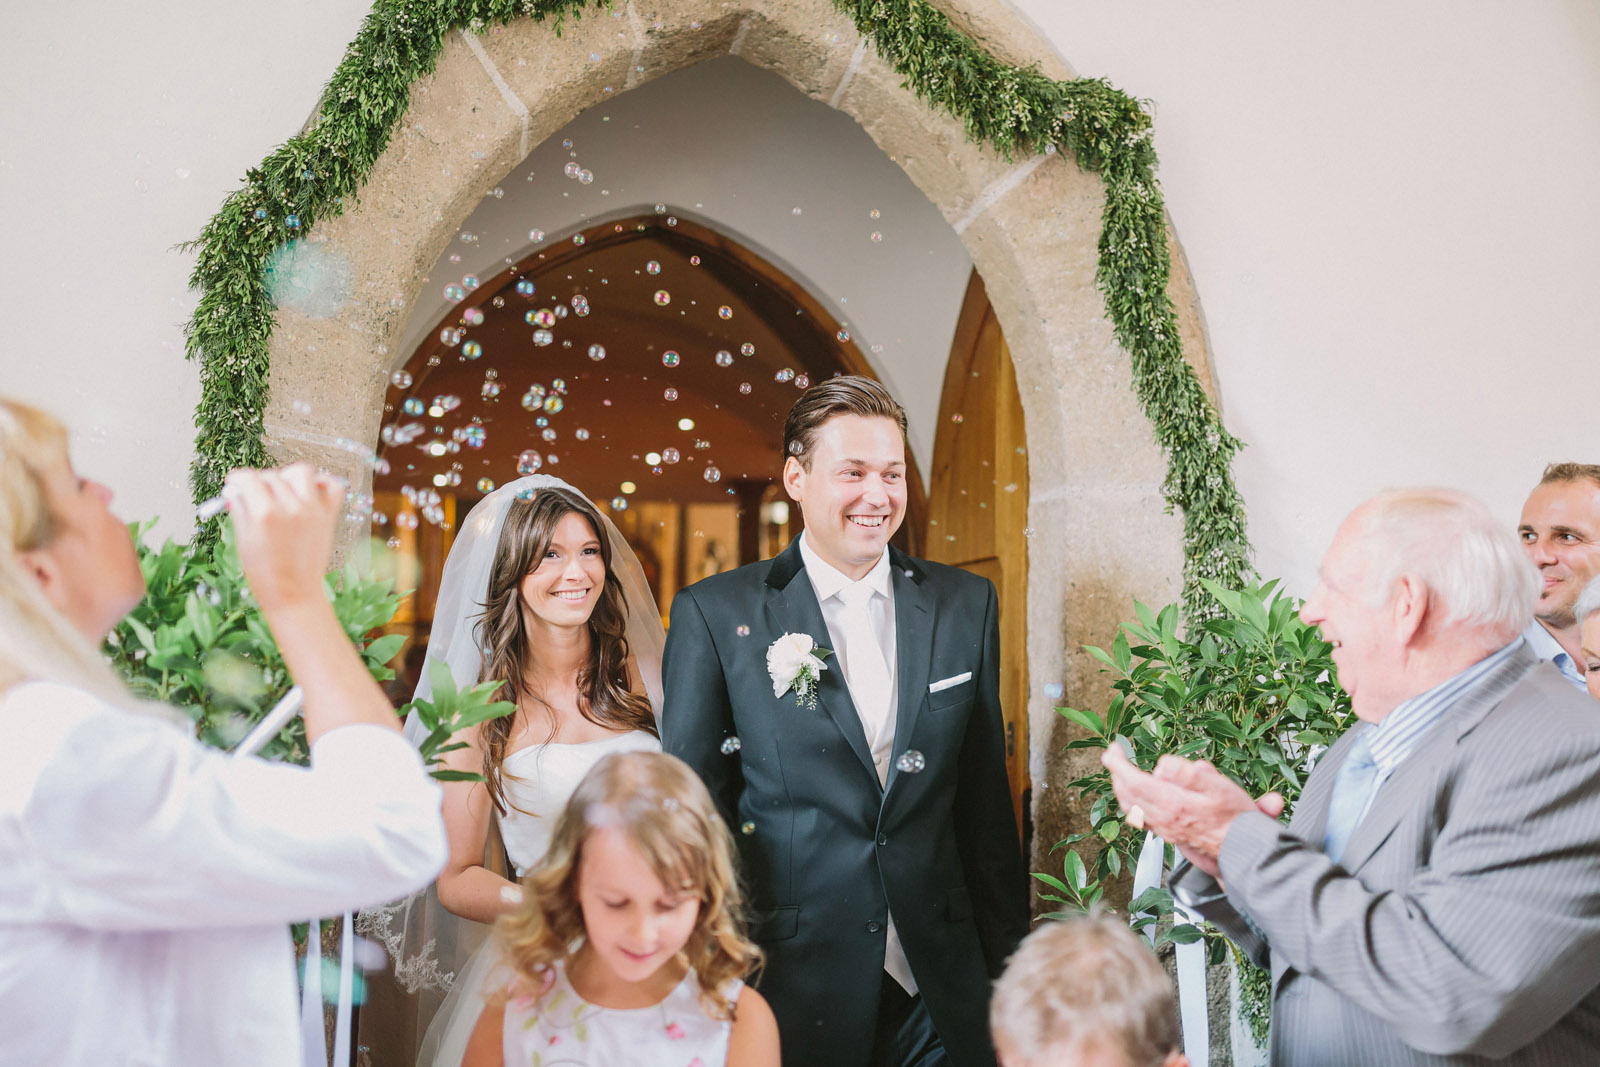 026-upper-austria-wedding-ceremony